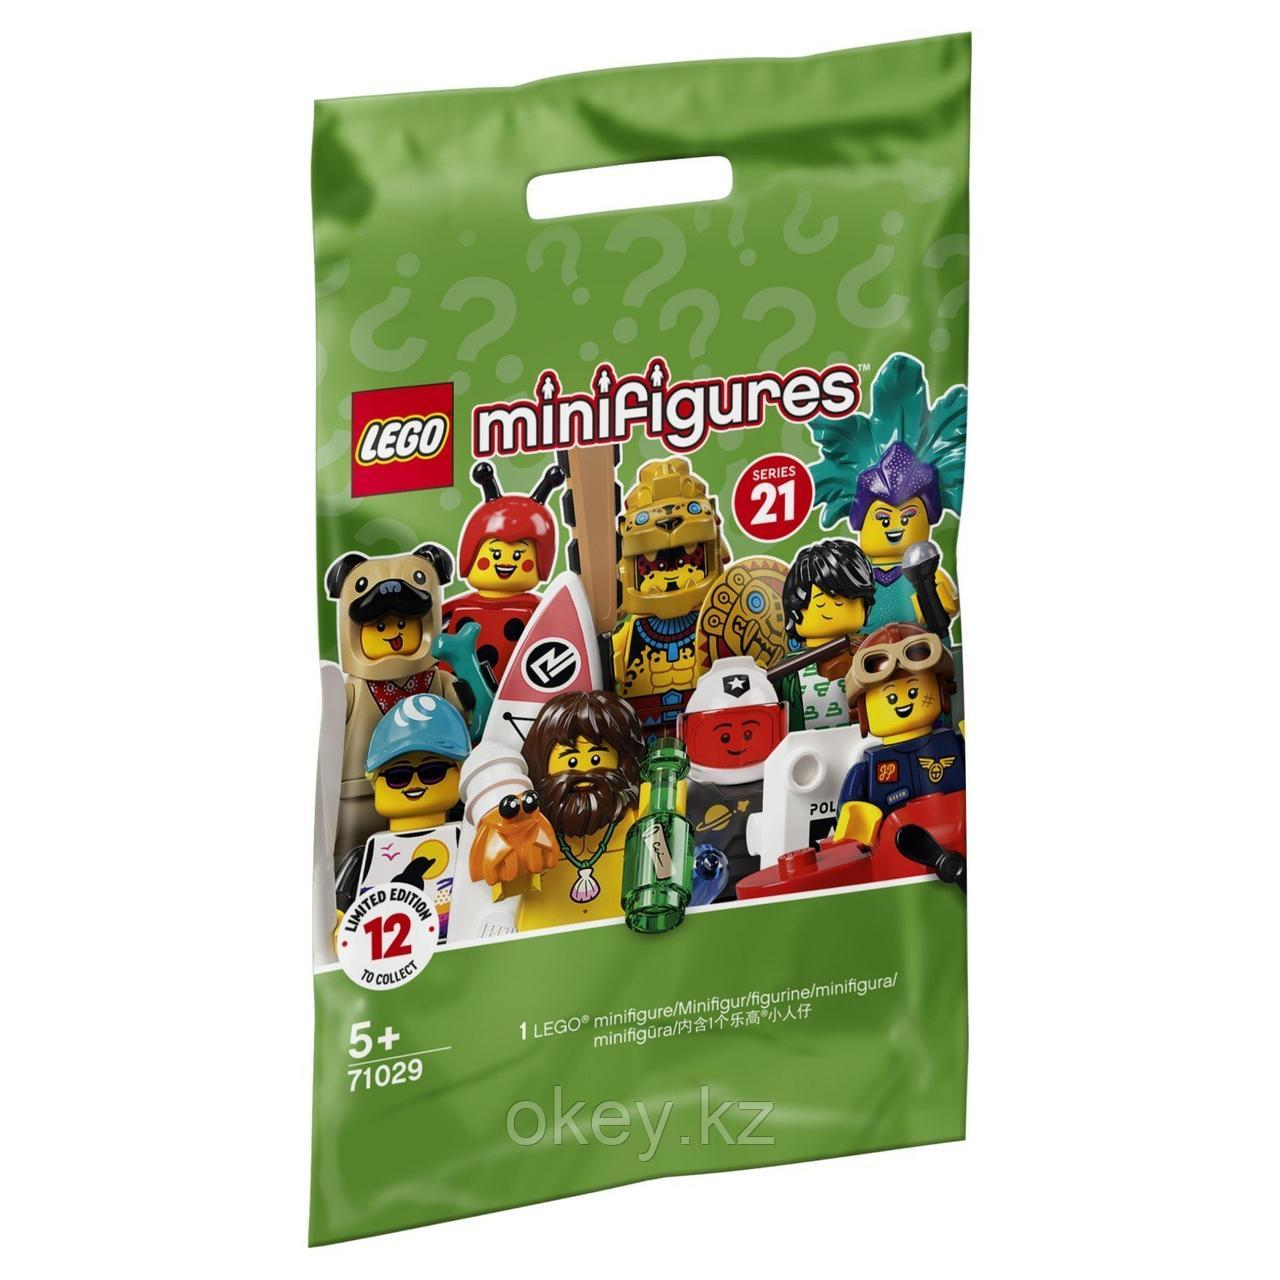 LEGO Minifigures: Минифигурки Серия 21, 71029